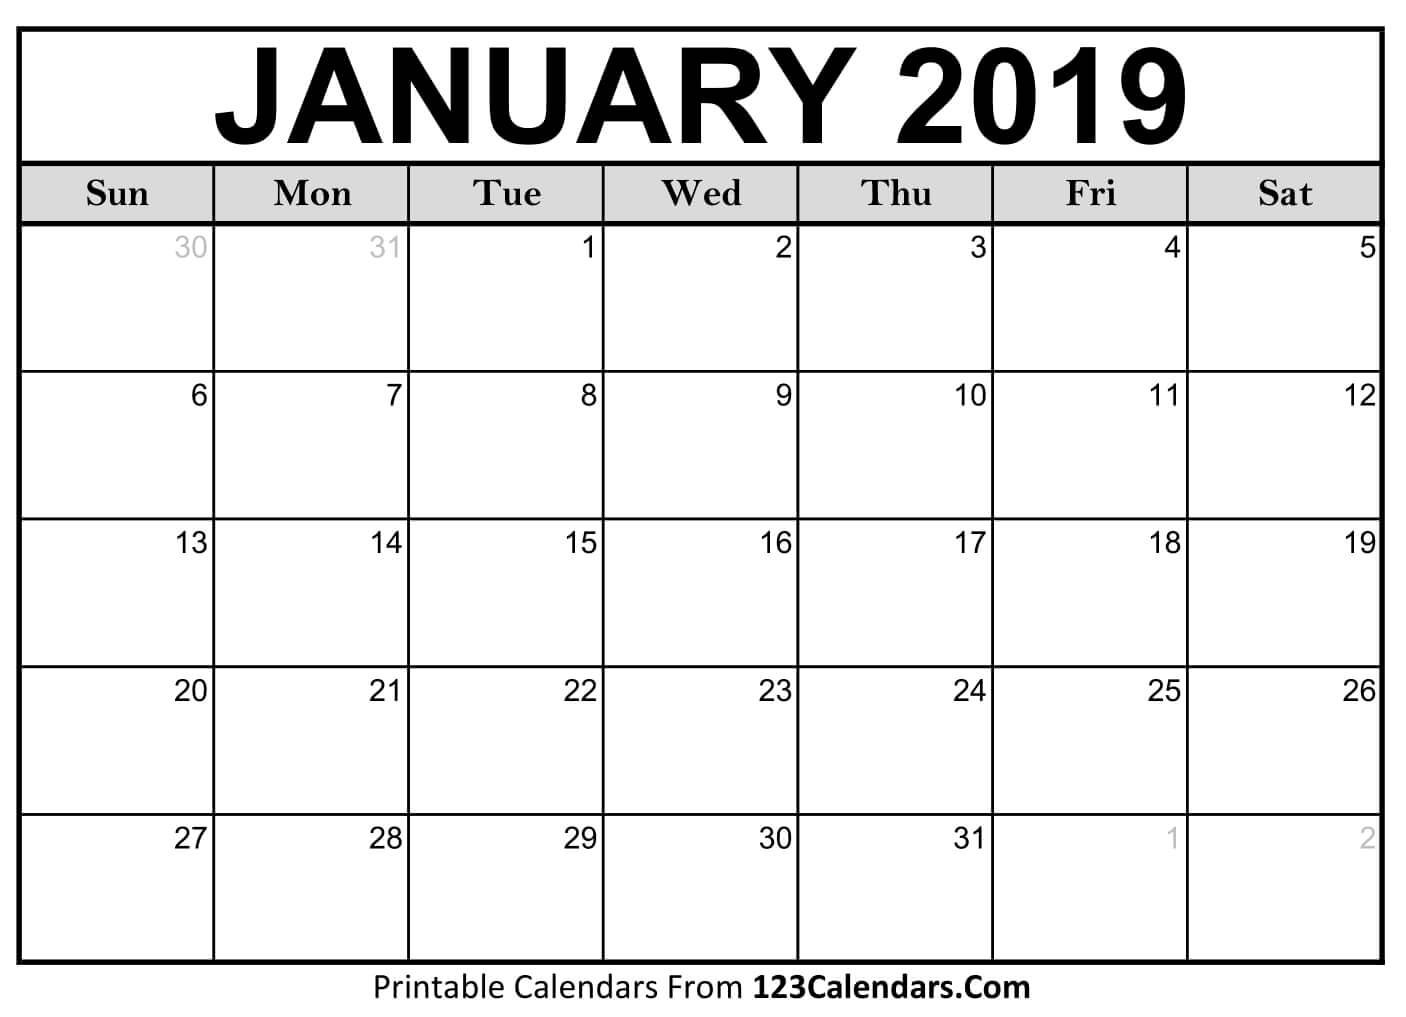 2019 January Calendar Printable – Printable Calendar 2019  Blank Calendar 2019 Jan Feb